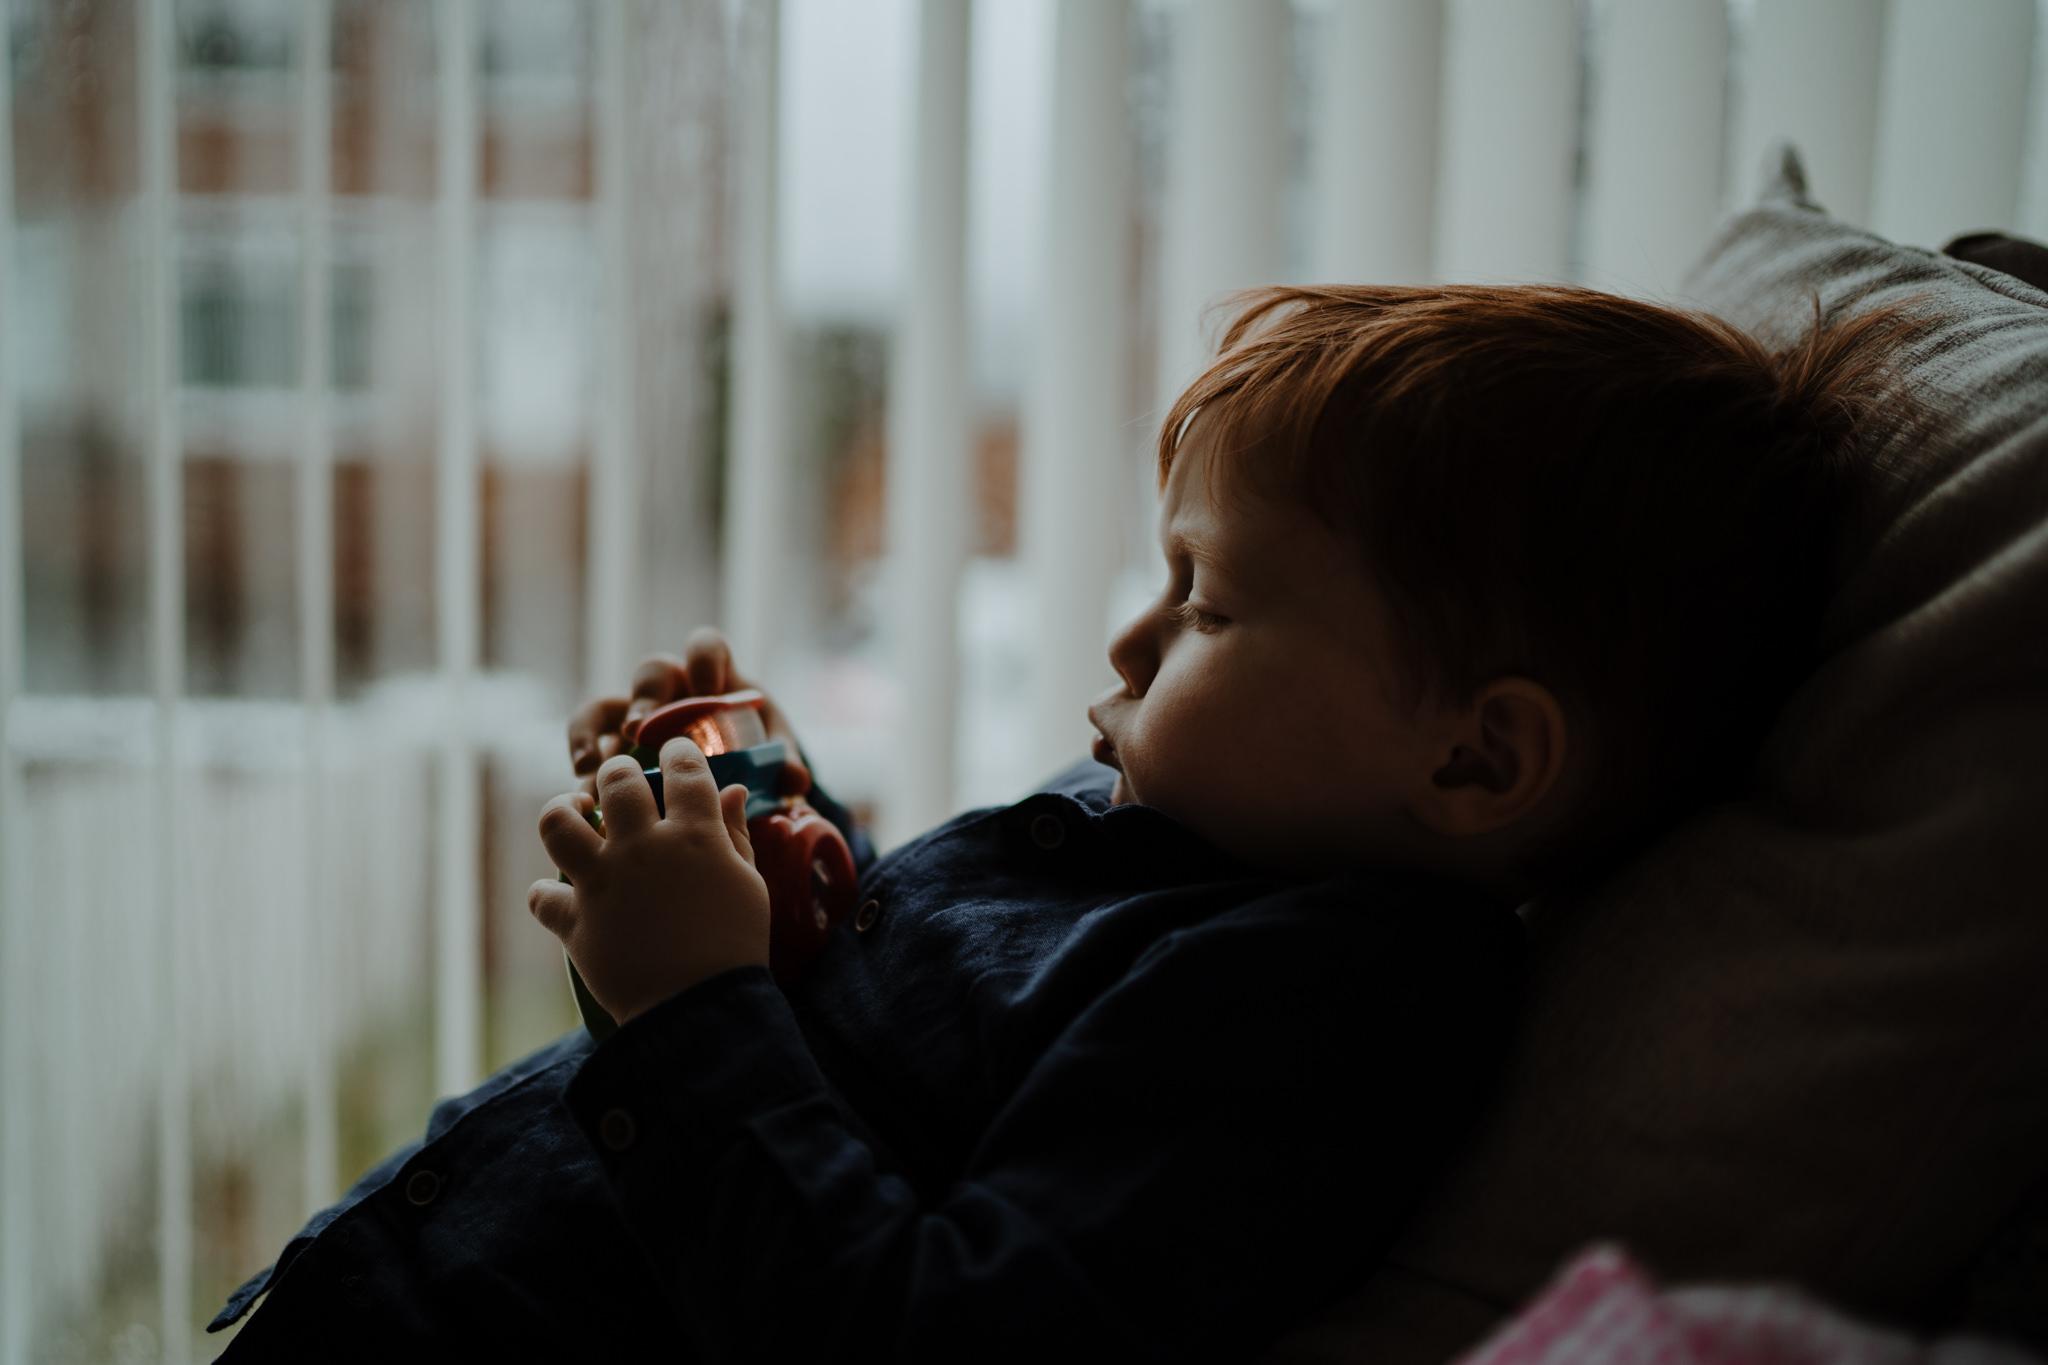 newborn-photographer-belfast-the-snug-sessions-Nora-41.jpg